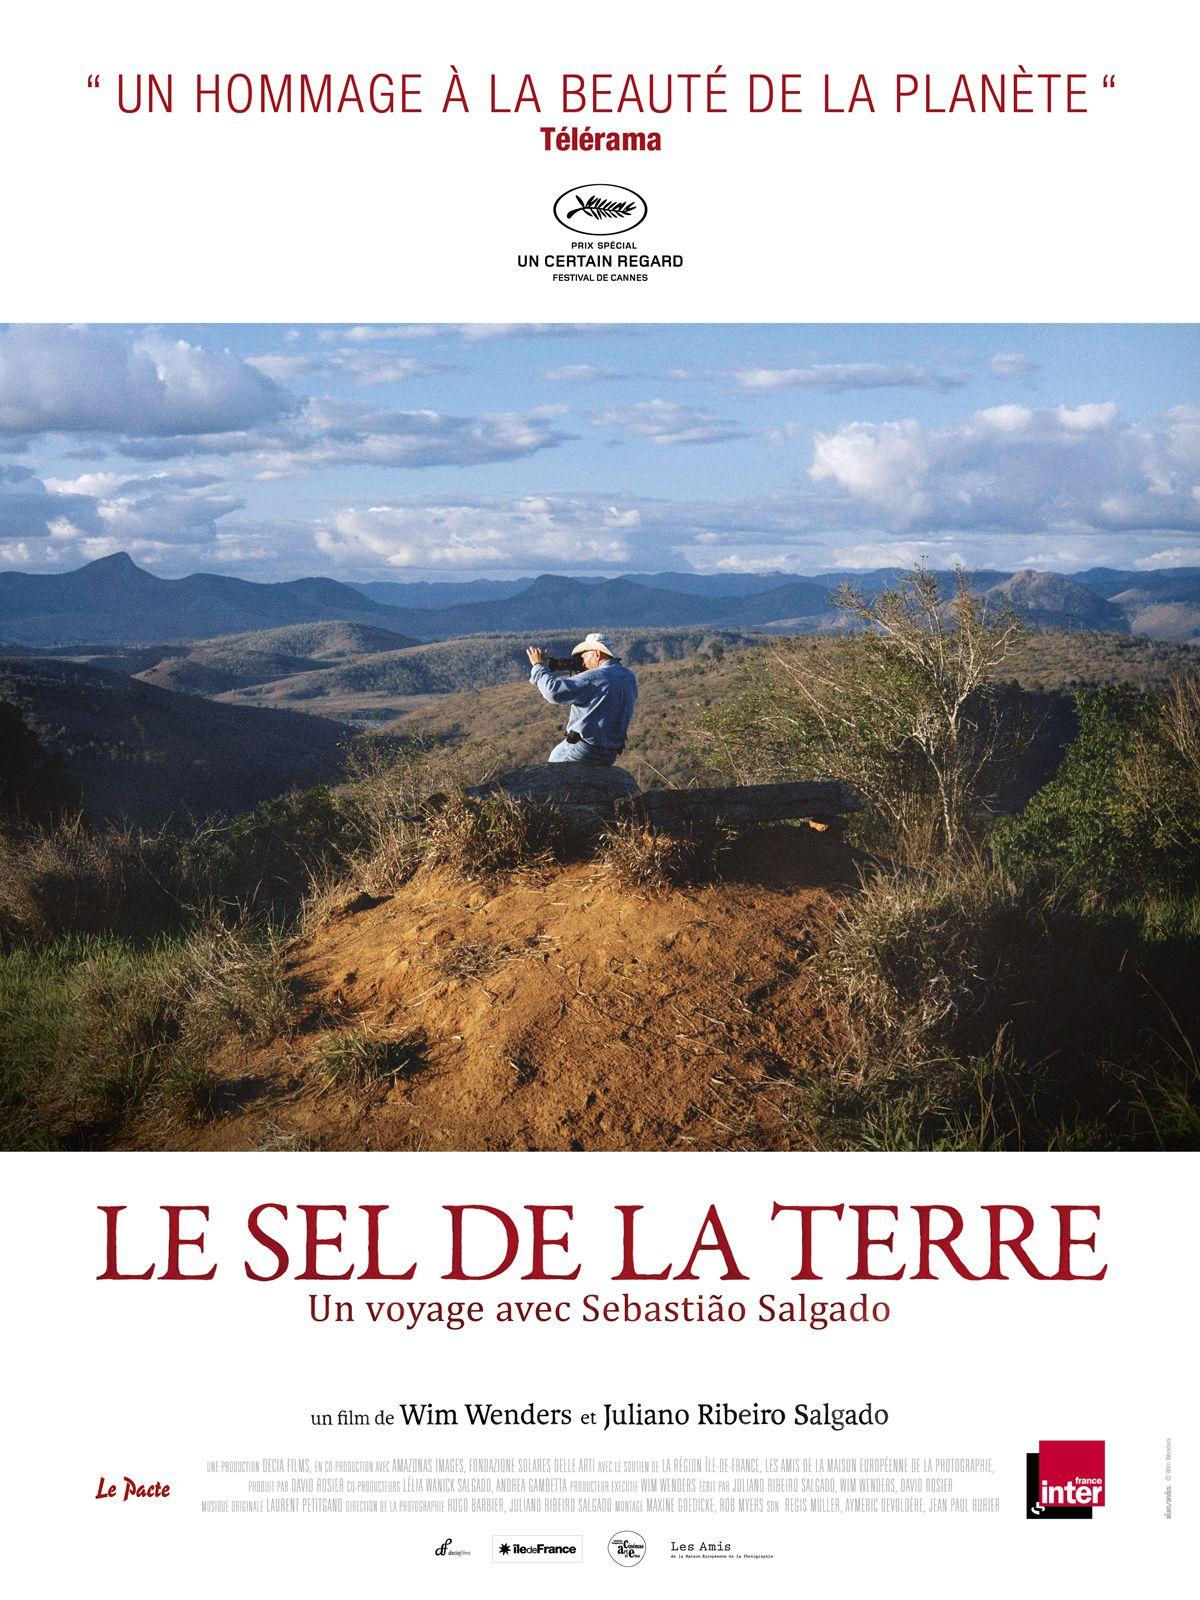 Le Sel de la terre - Documentaire (2014)